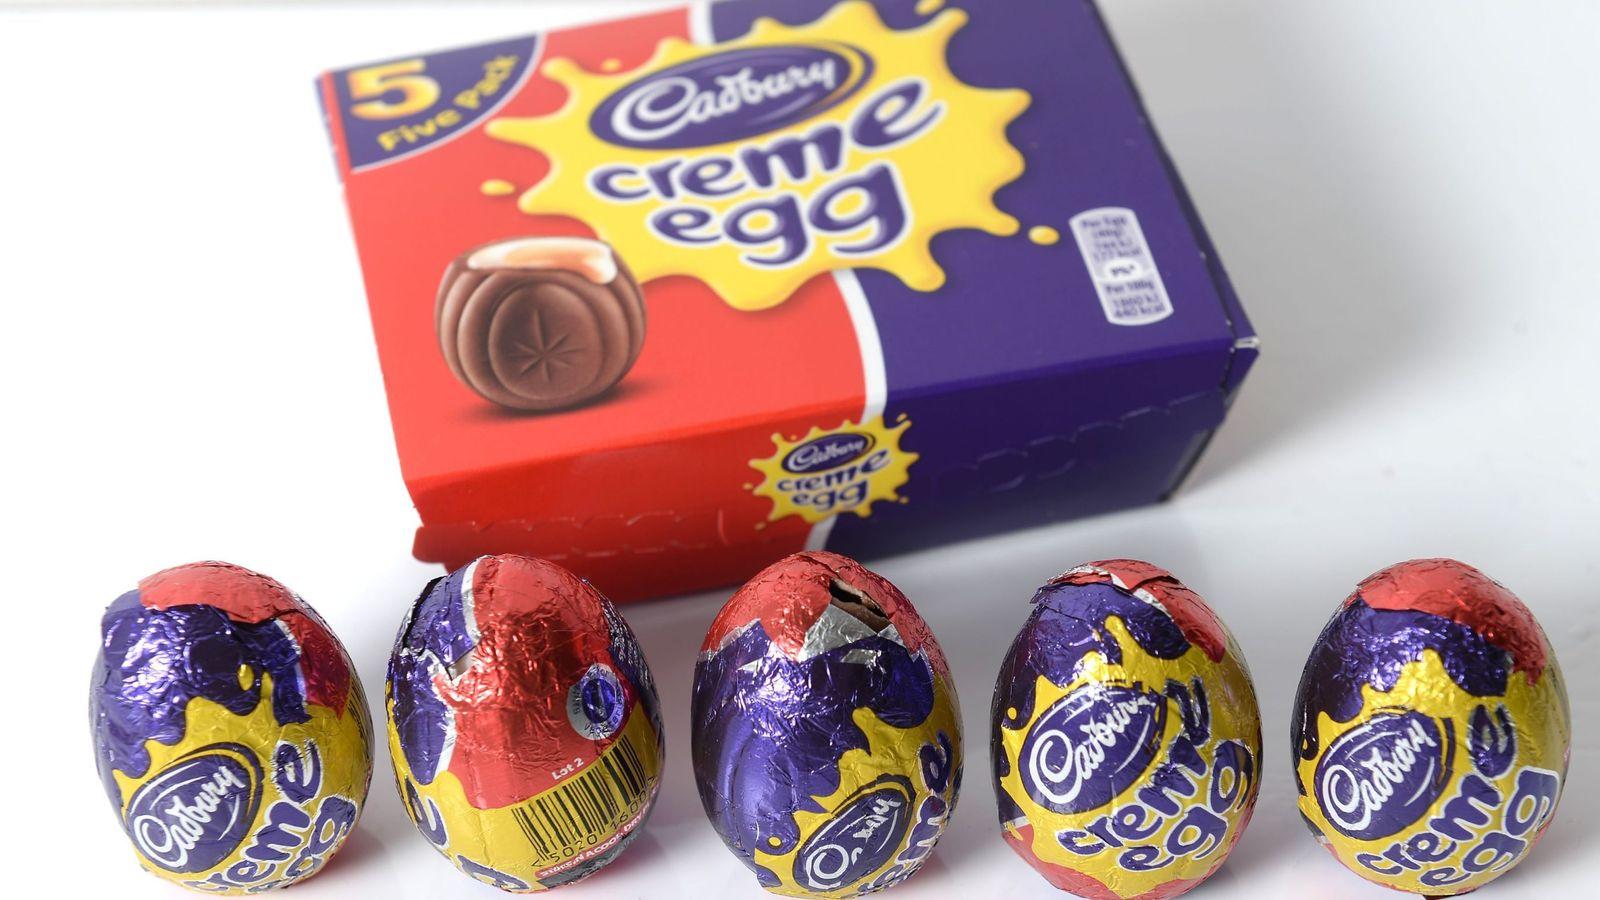 cadburys creme egg announcement - HD1280×807